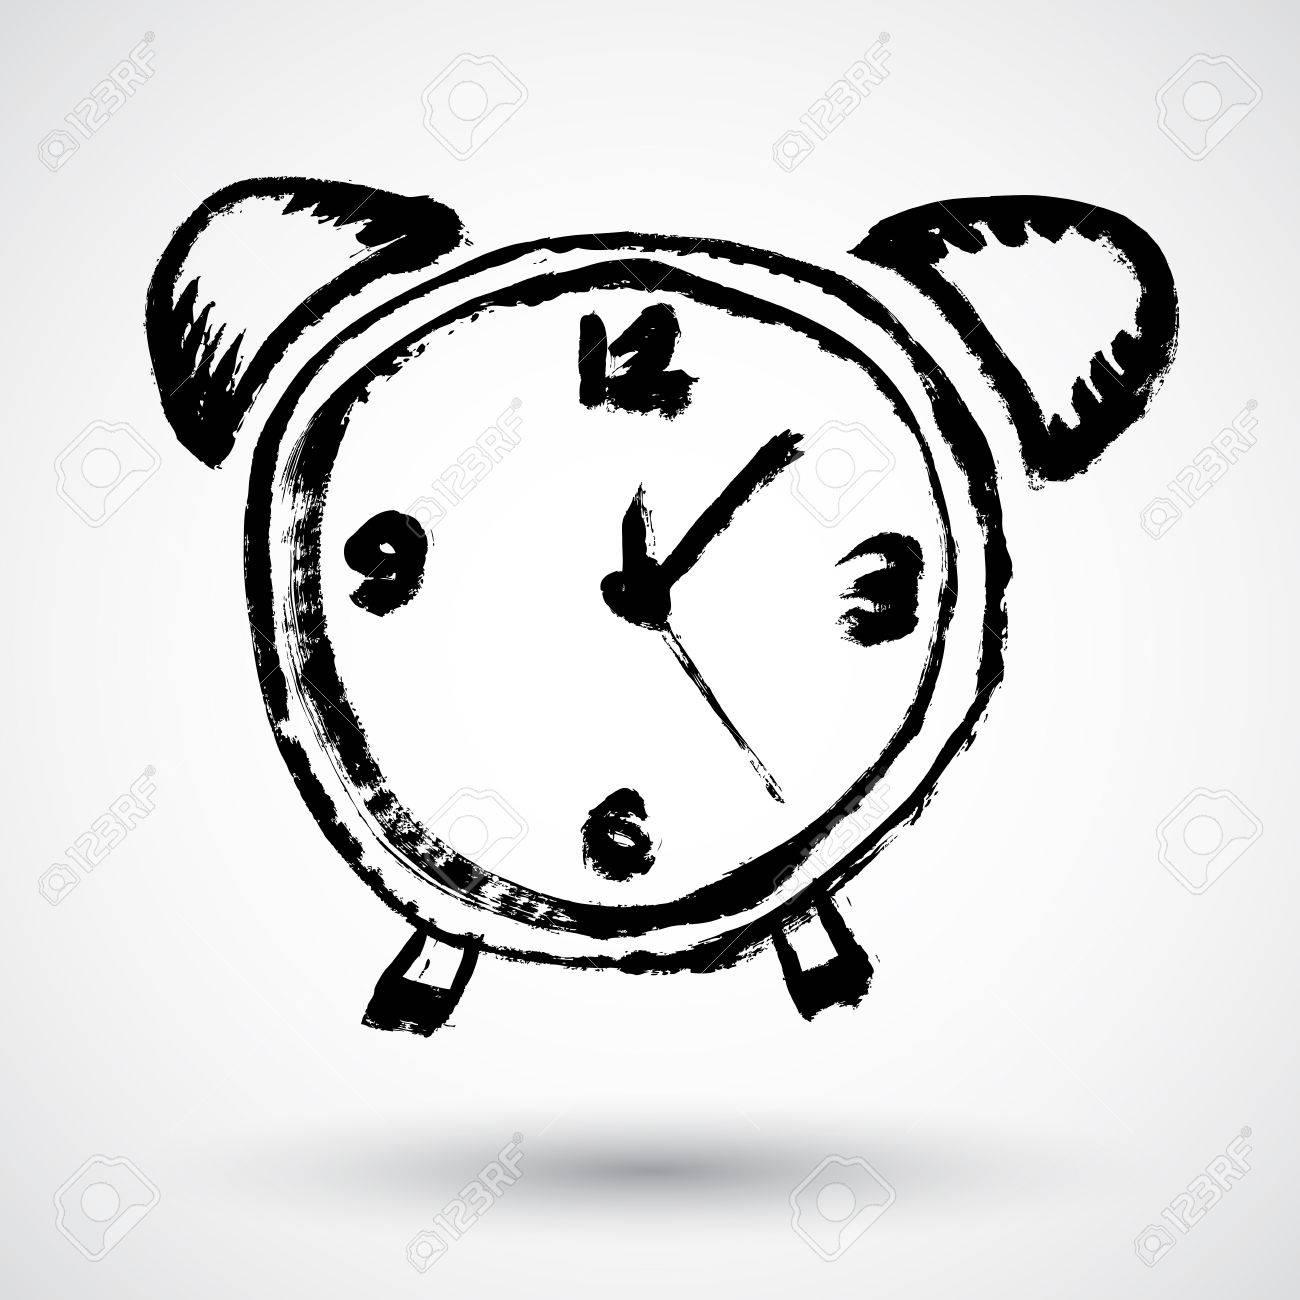 1300x1300 Alarm Clock. Sketch Royalty Free Cliparts, Vectors, And Stock